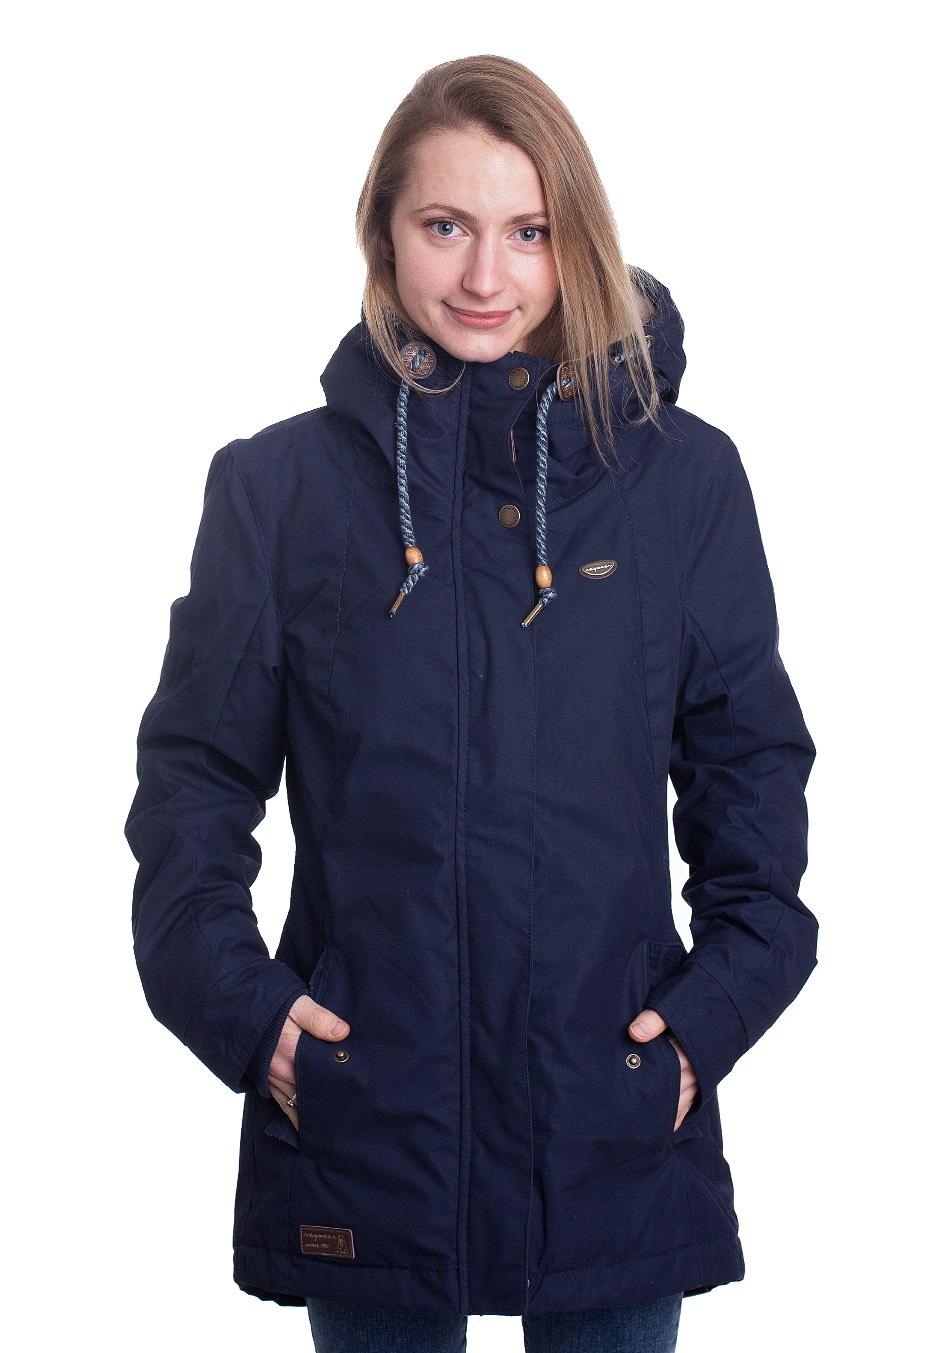 Jacken - Ragwear Monade Navy Jacken  - Onlineshop IMPERICON